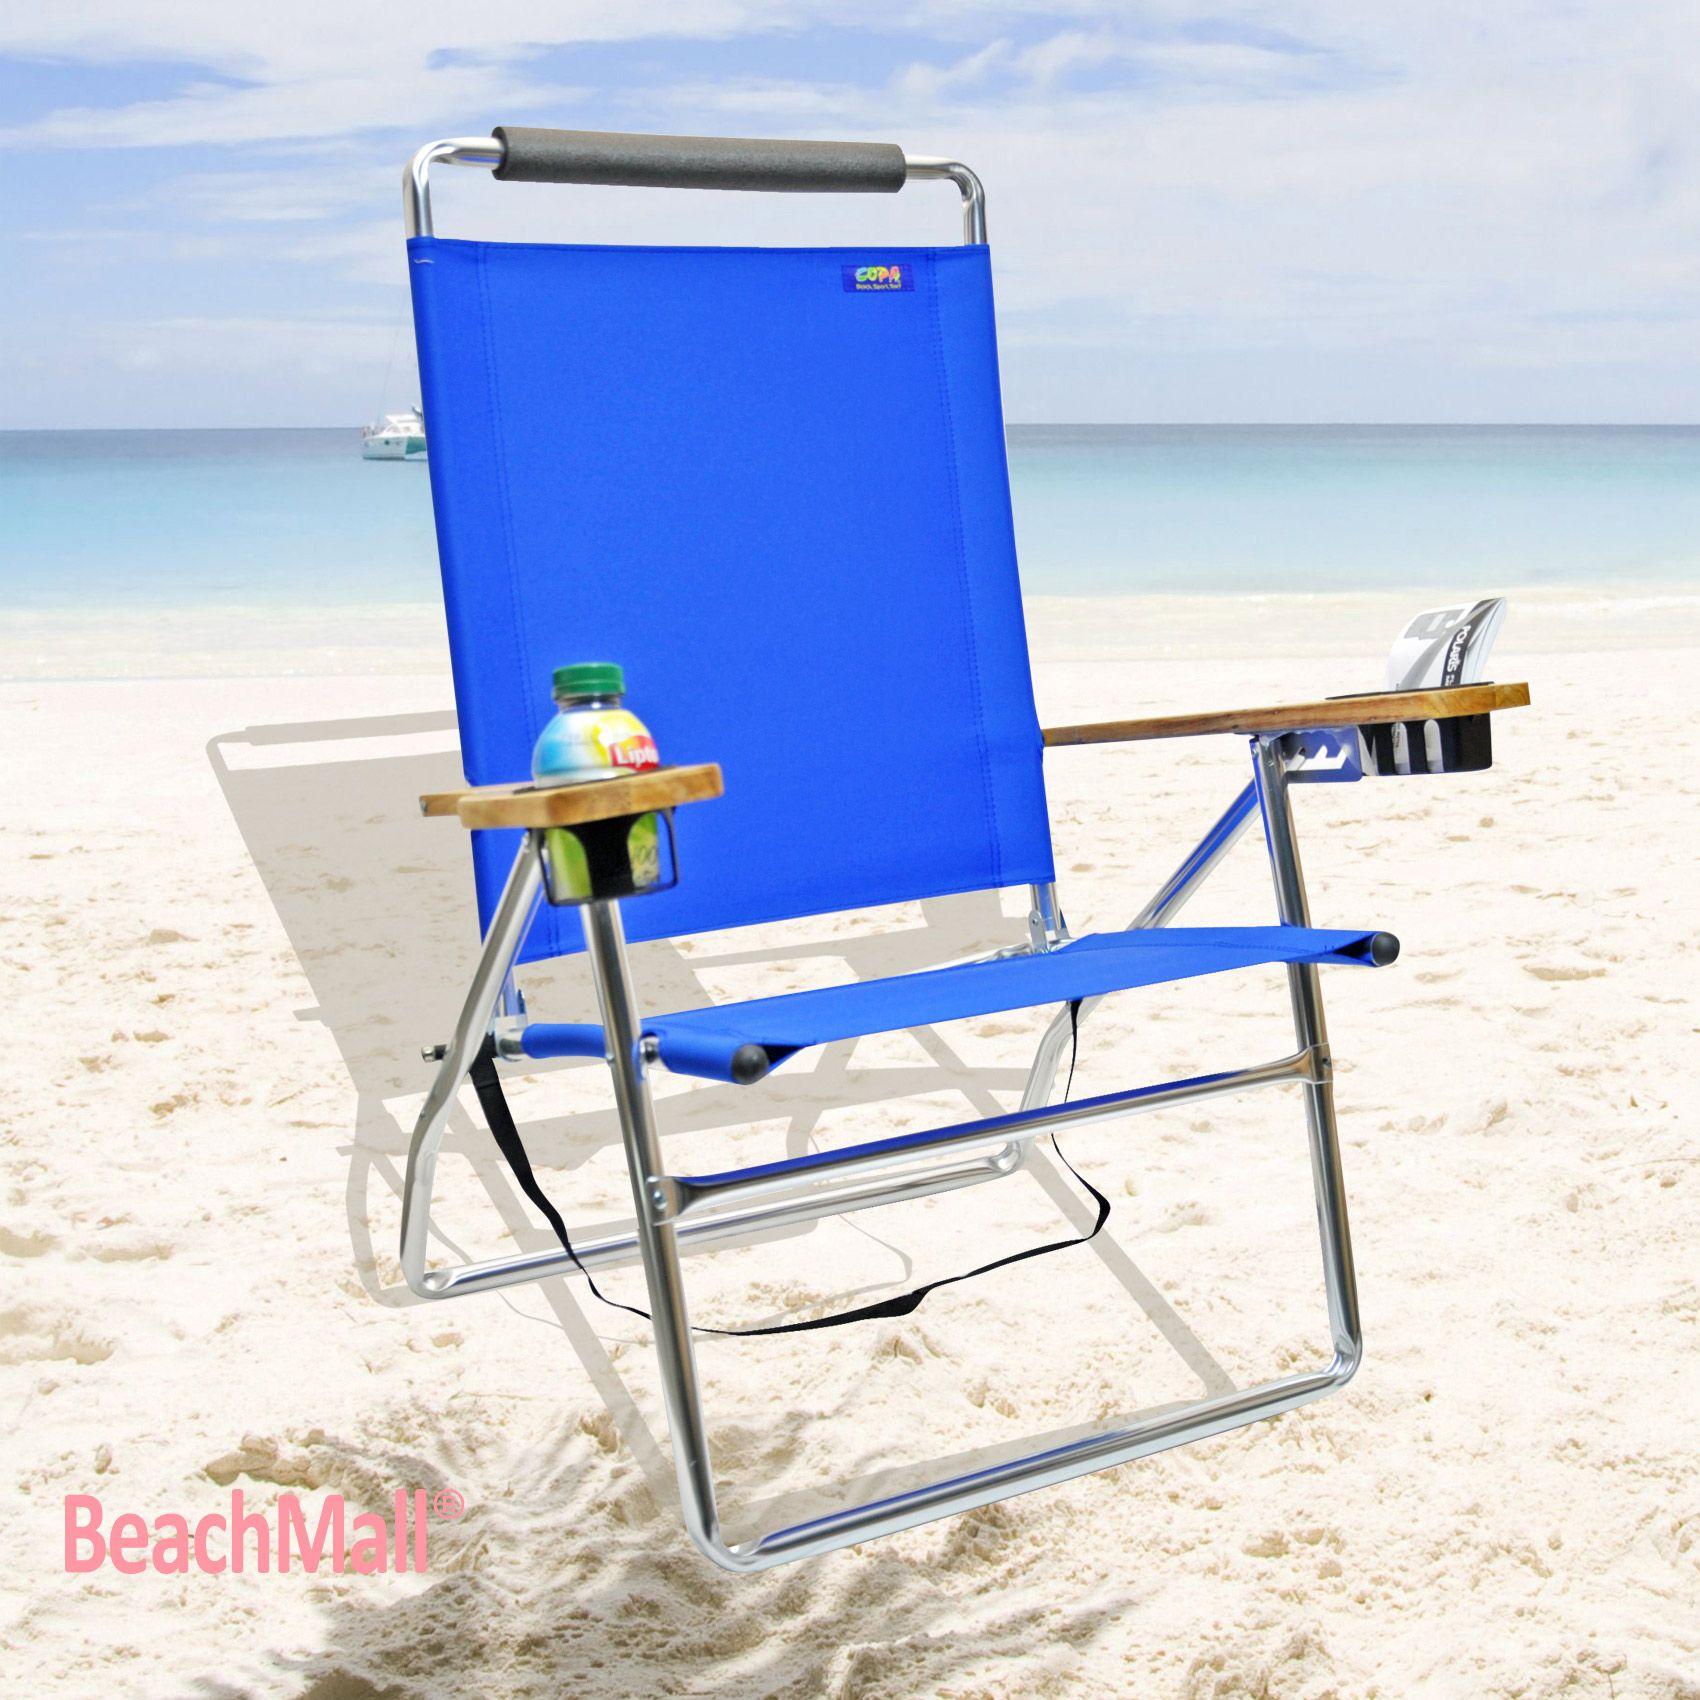 Deluxe 4 position High Beach Chair http//www.beachmall